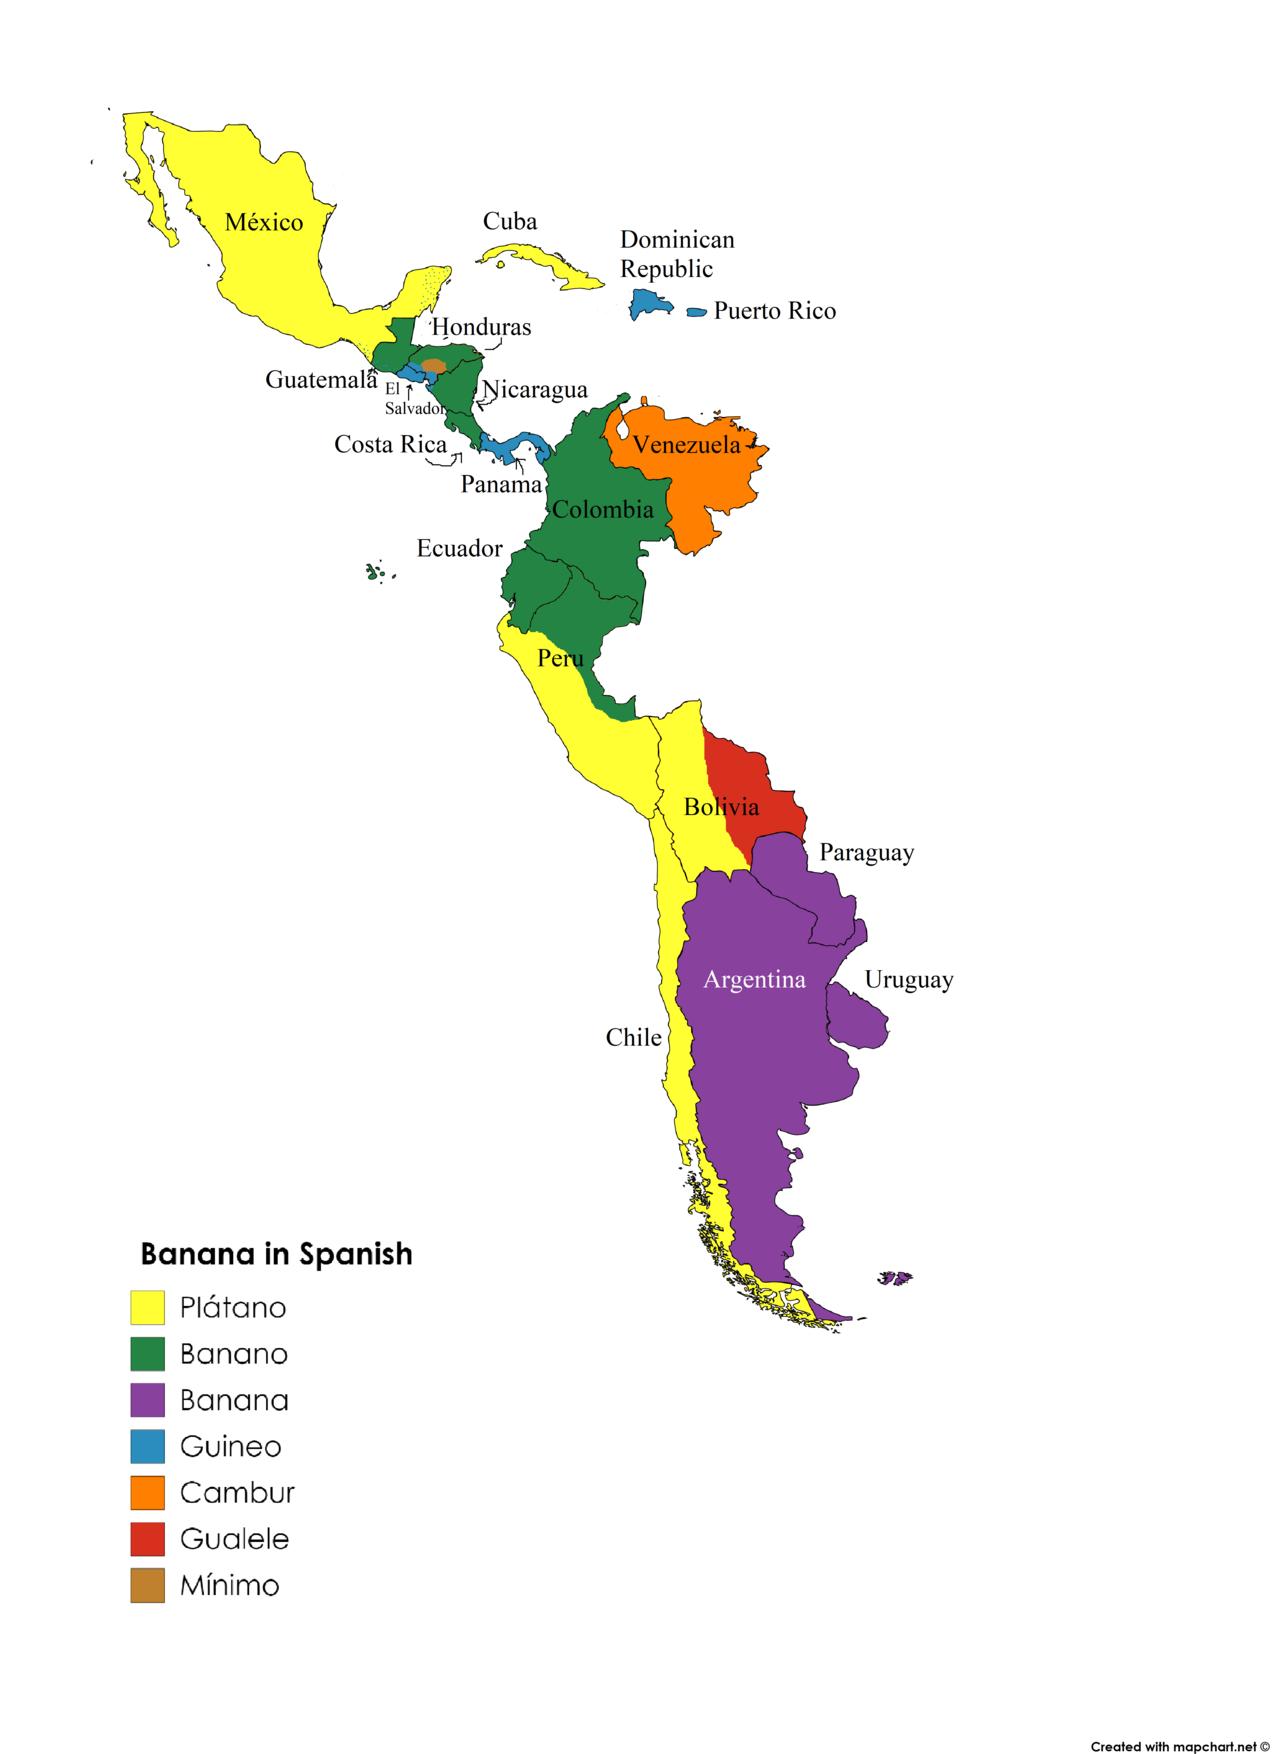 Banana In Spanish In Latin America Latin America Map Learning Spanish Language Map